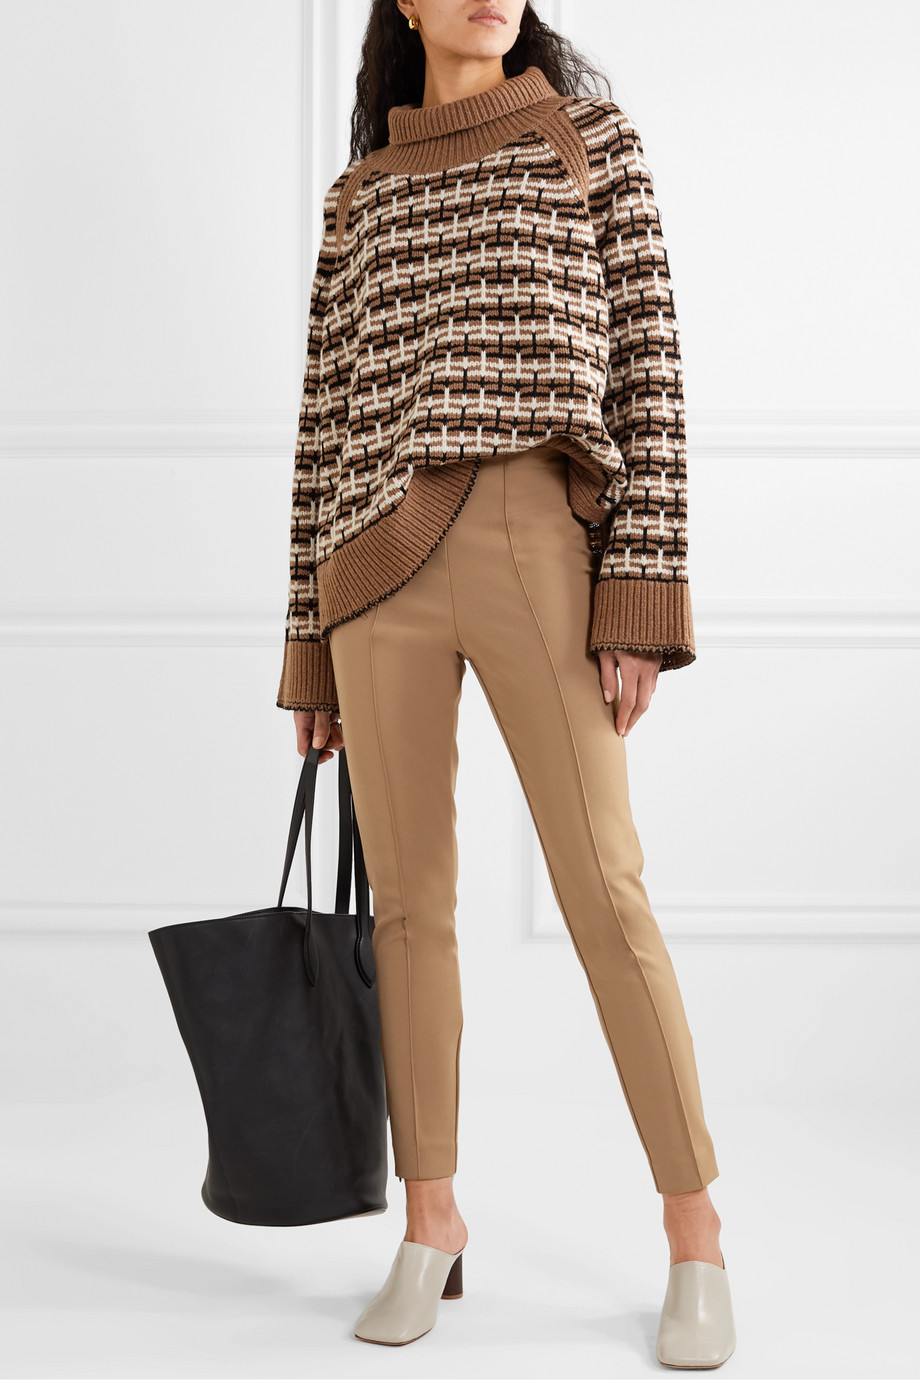 By Malene Birger Pantalon skinny en cady de coton mélangé stretch Adelio